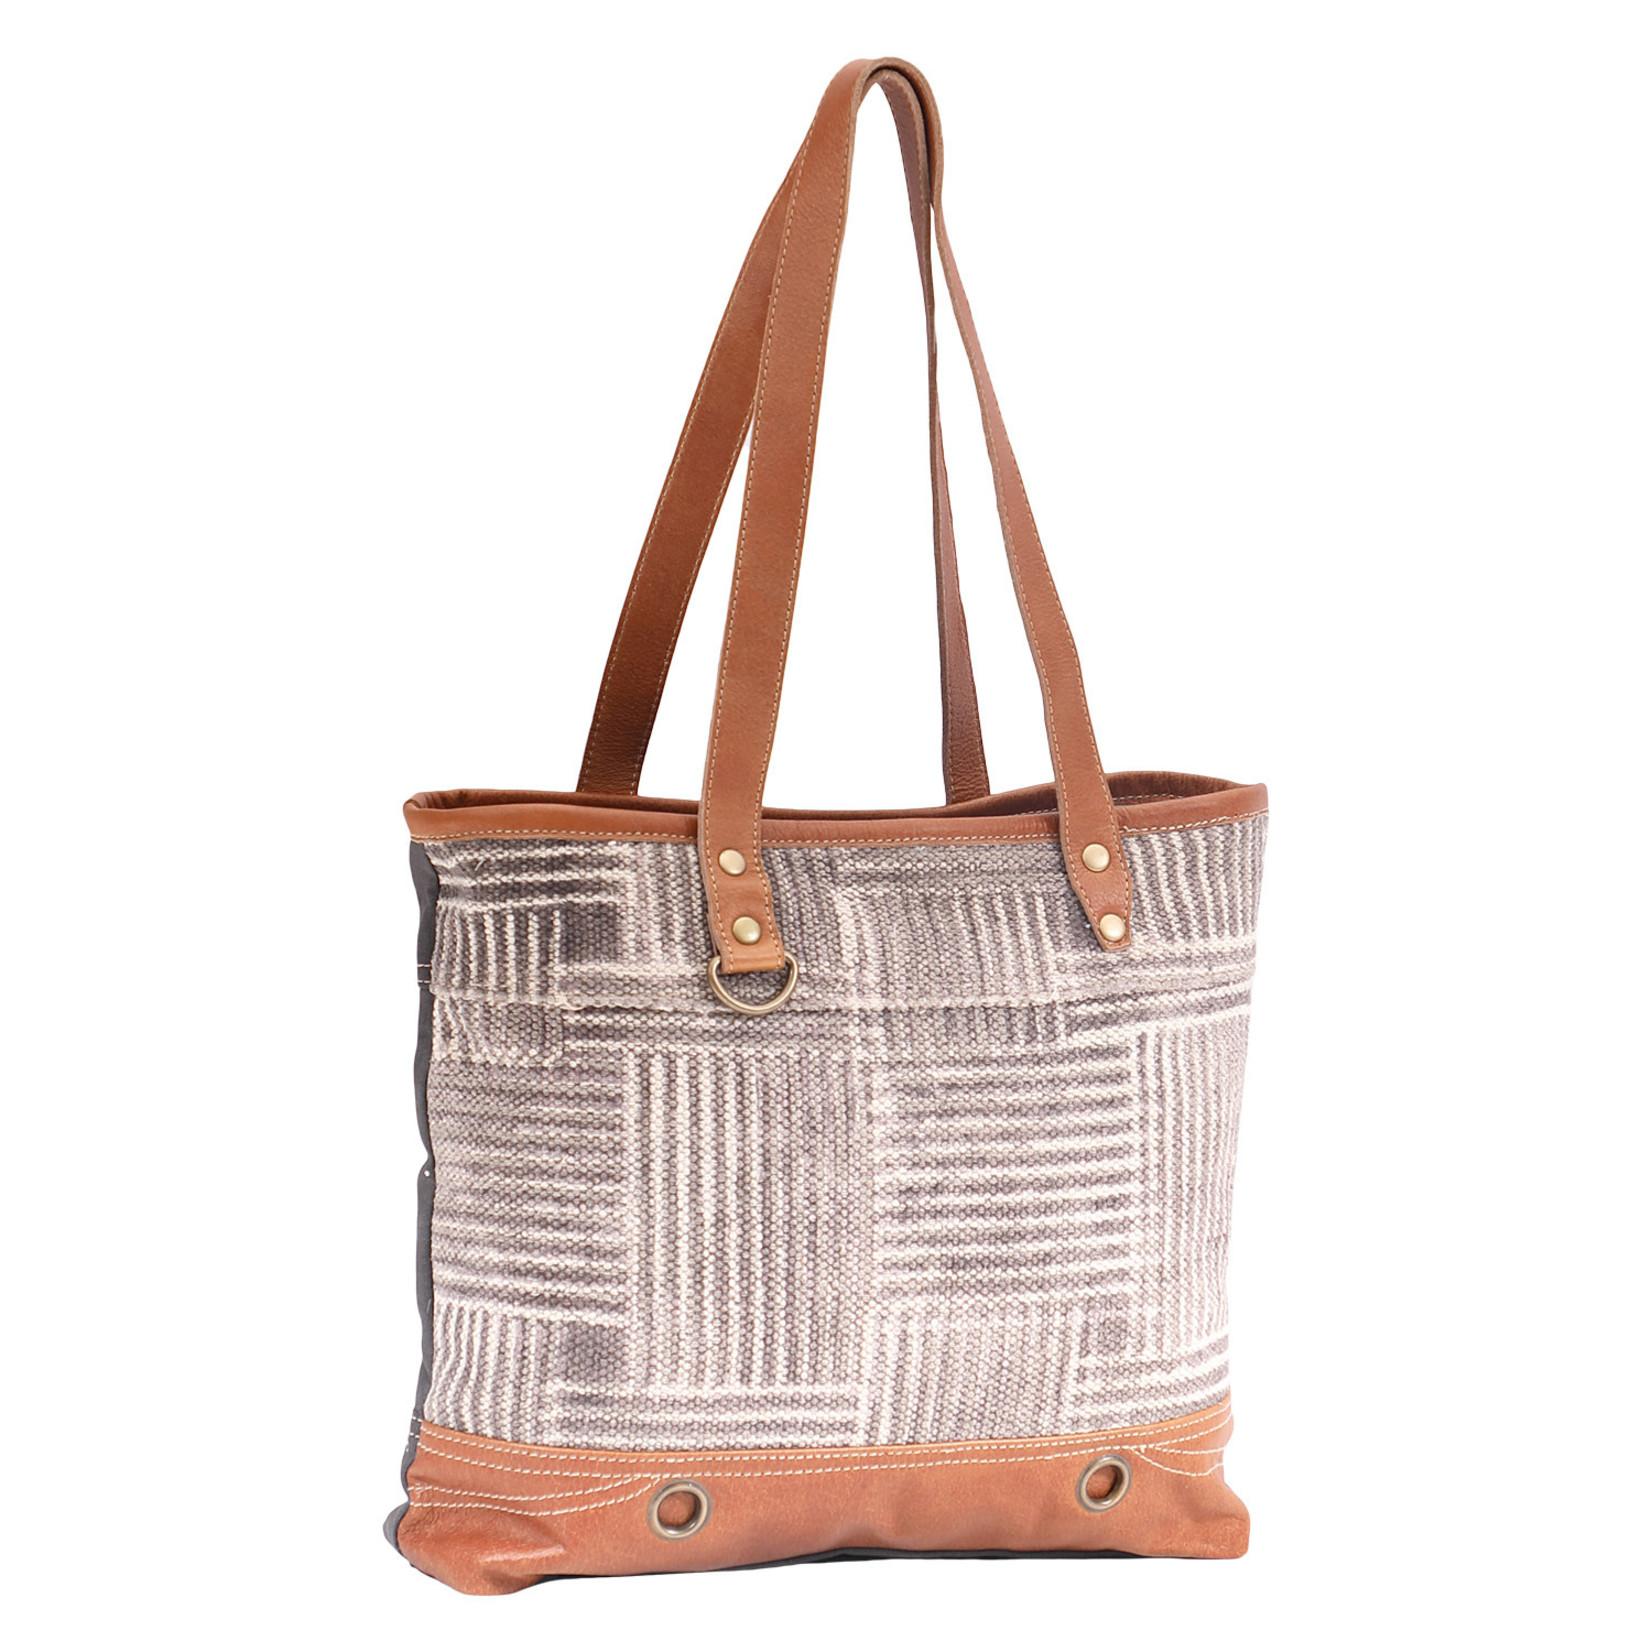 Myra Bags S-1593 The Irregular Tote Bag